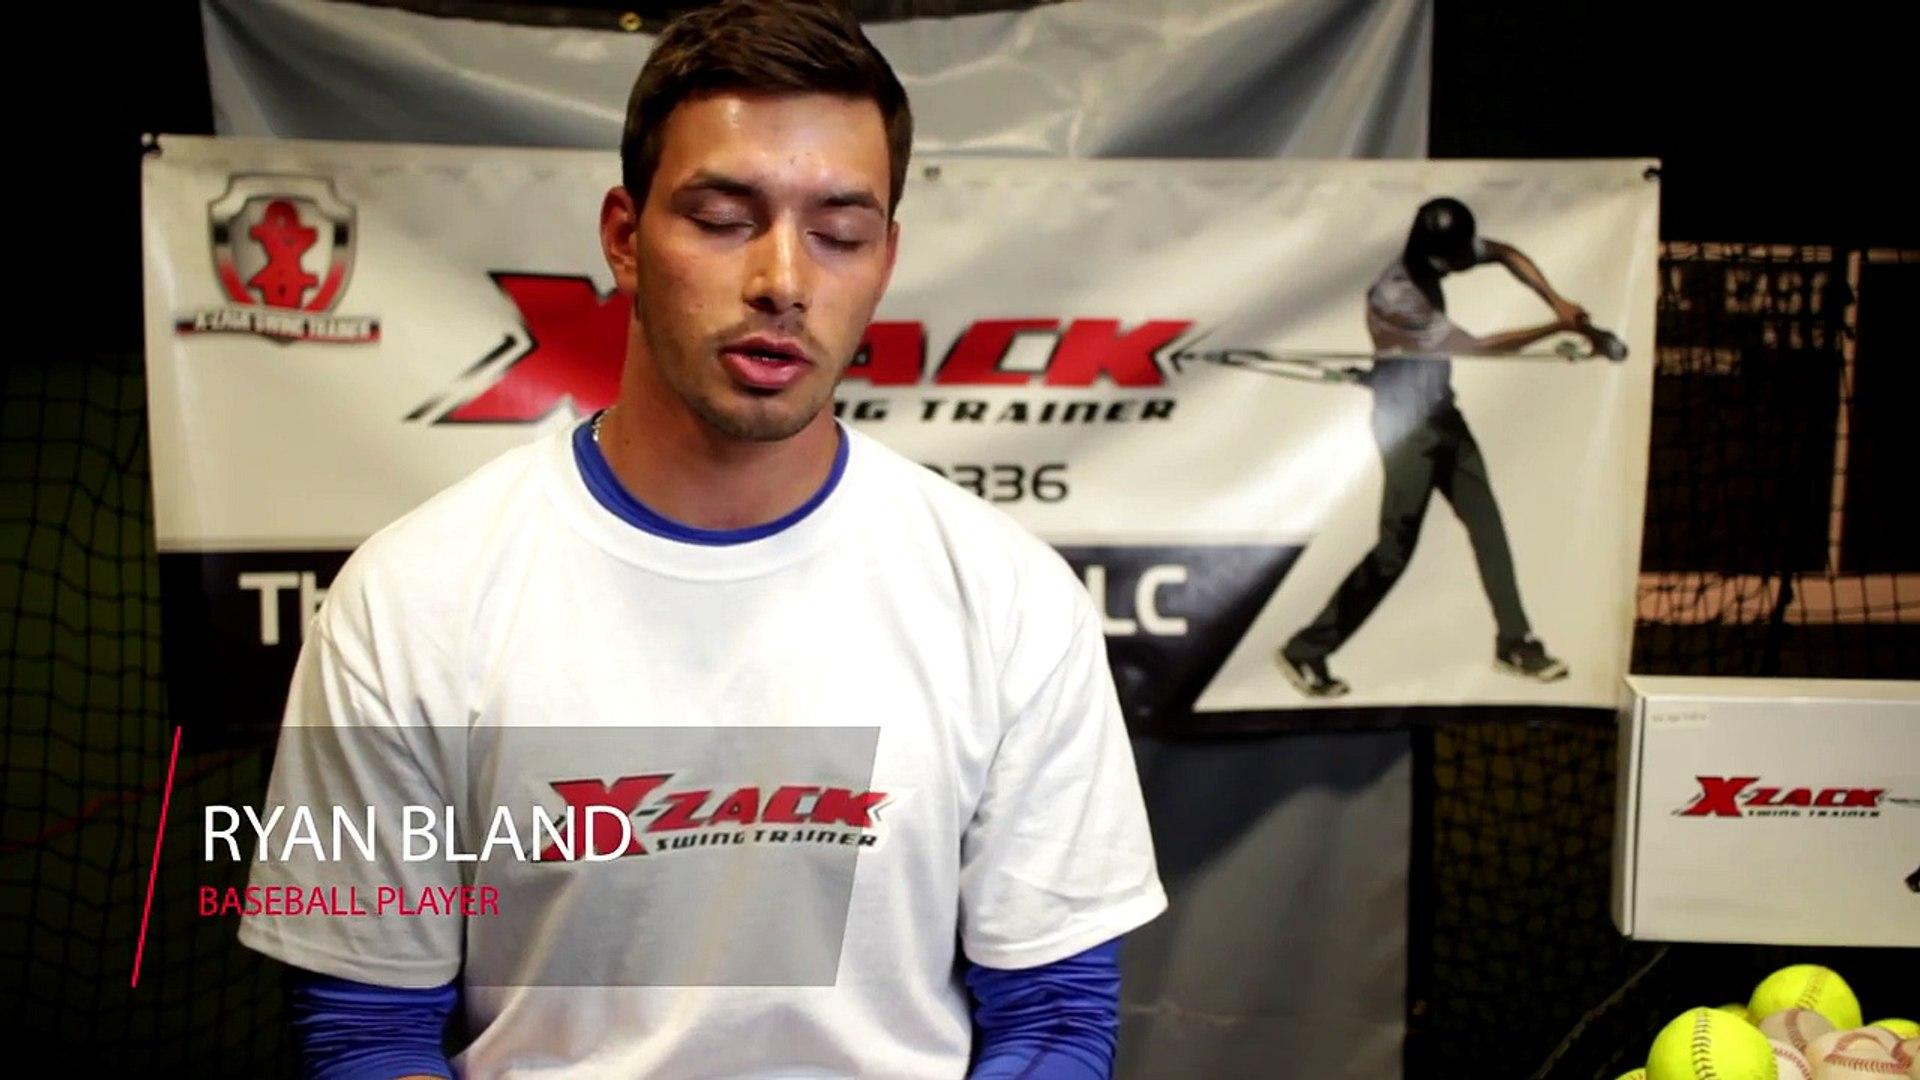 Ryan Bland Xzack Swing Trainer Interview